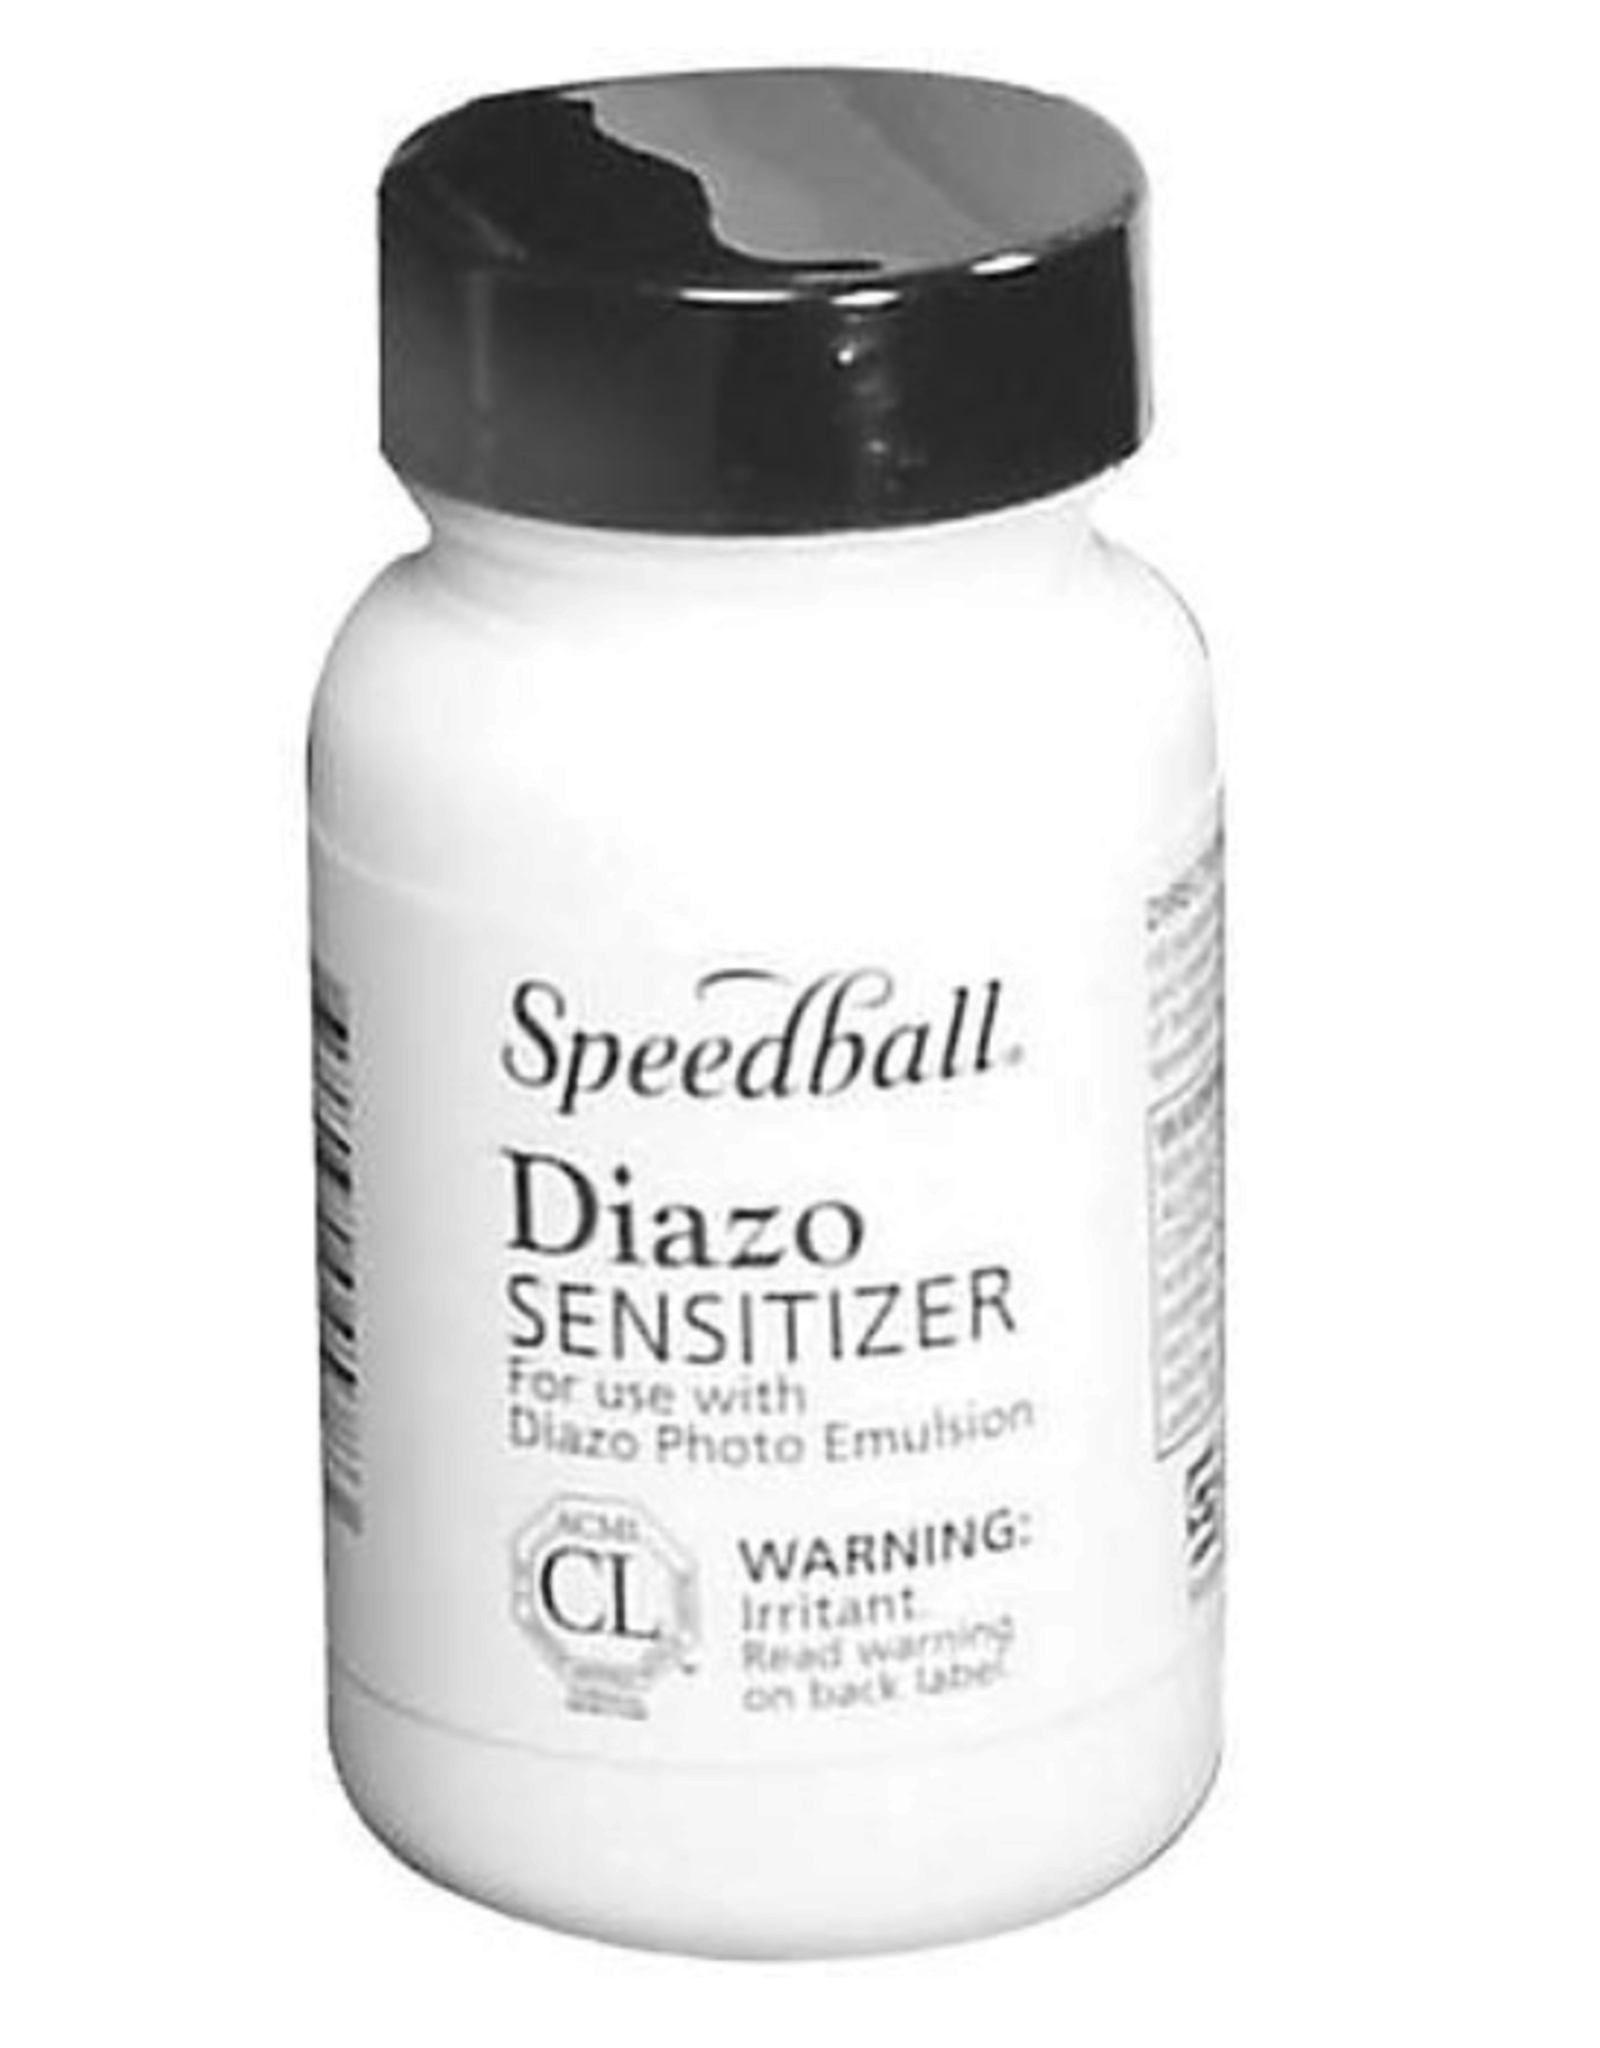 Speedball Diazo Sensitizer, 2 oz